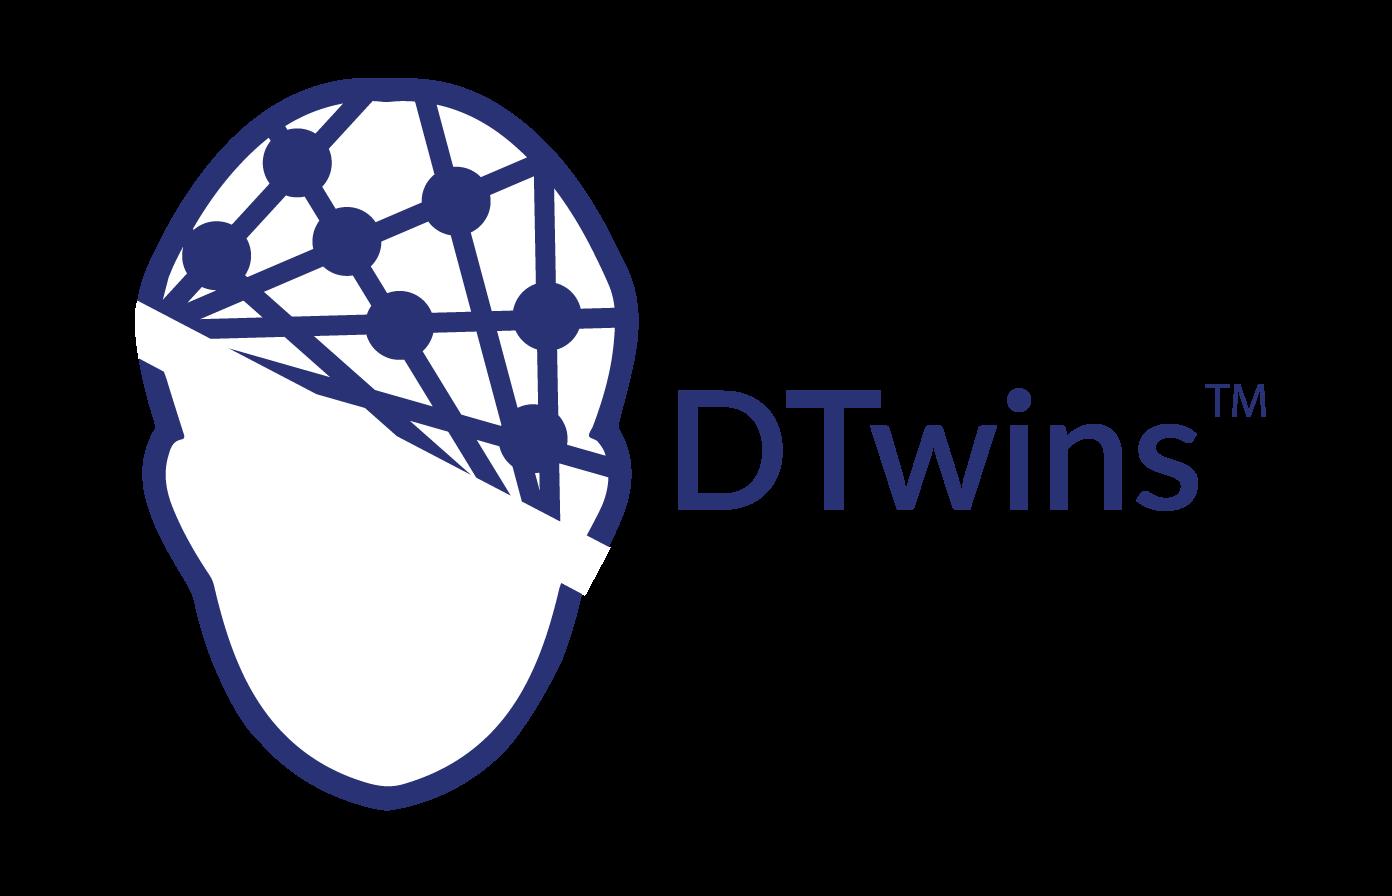 1st International Conference on Digital Twins Technologies